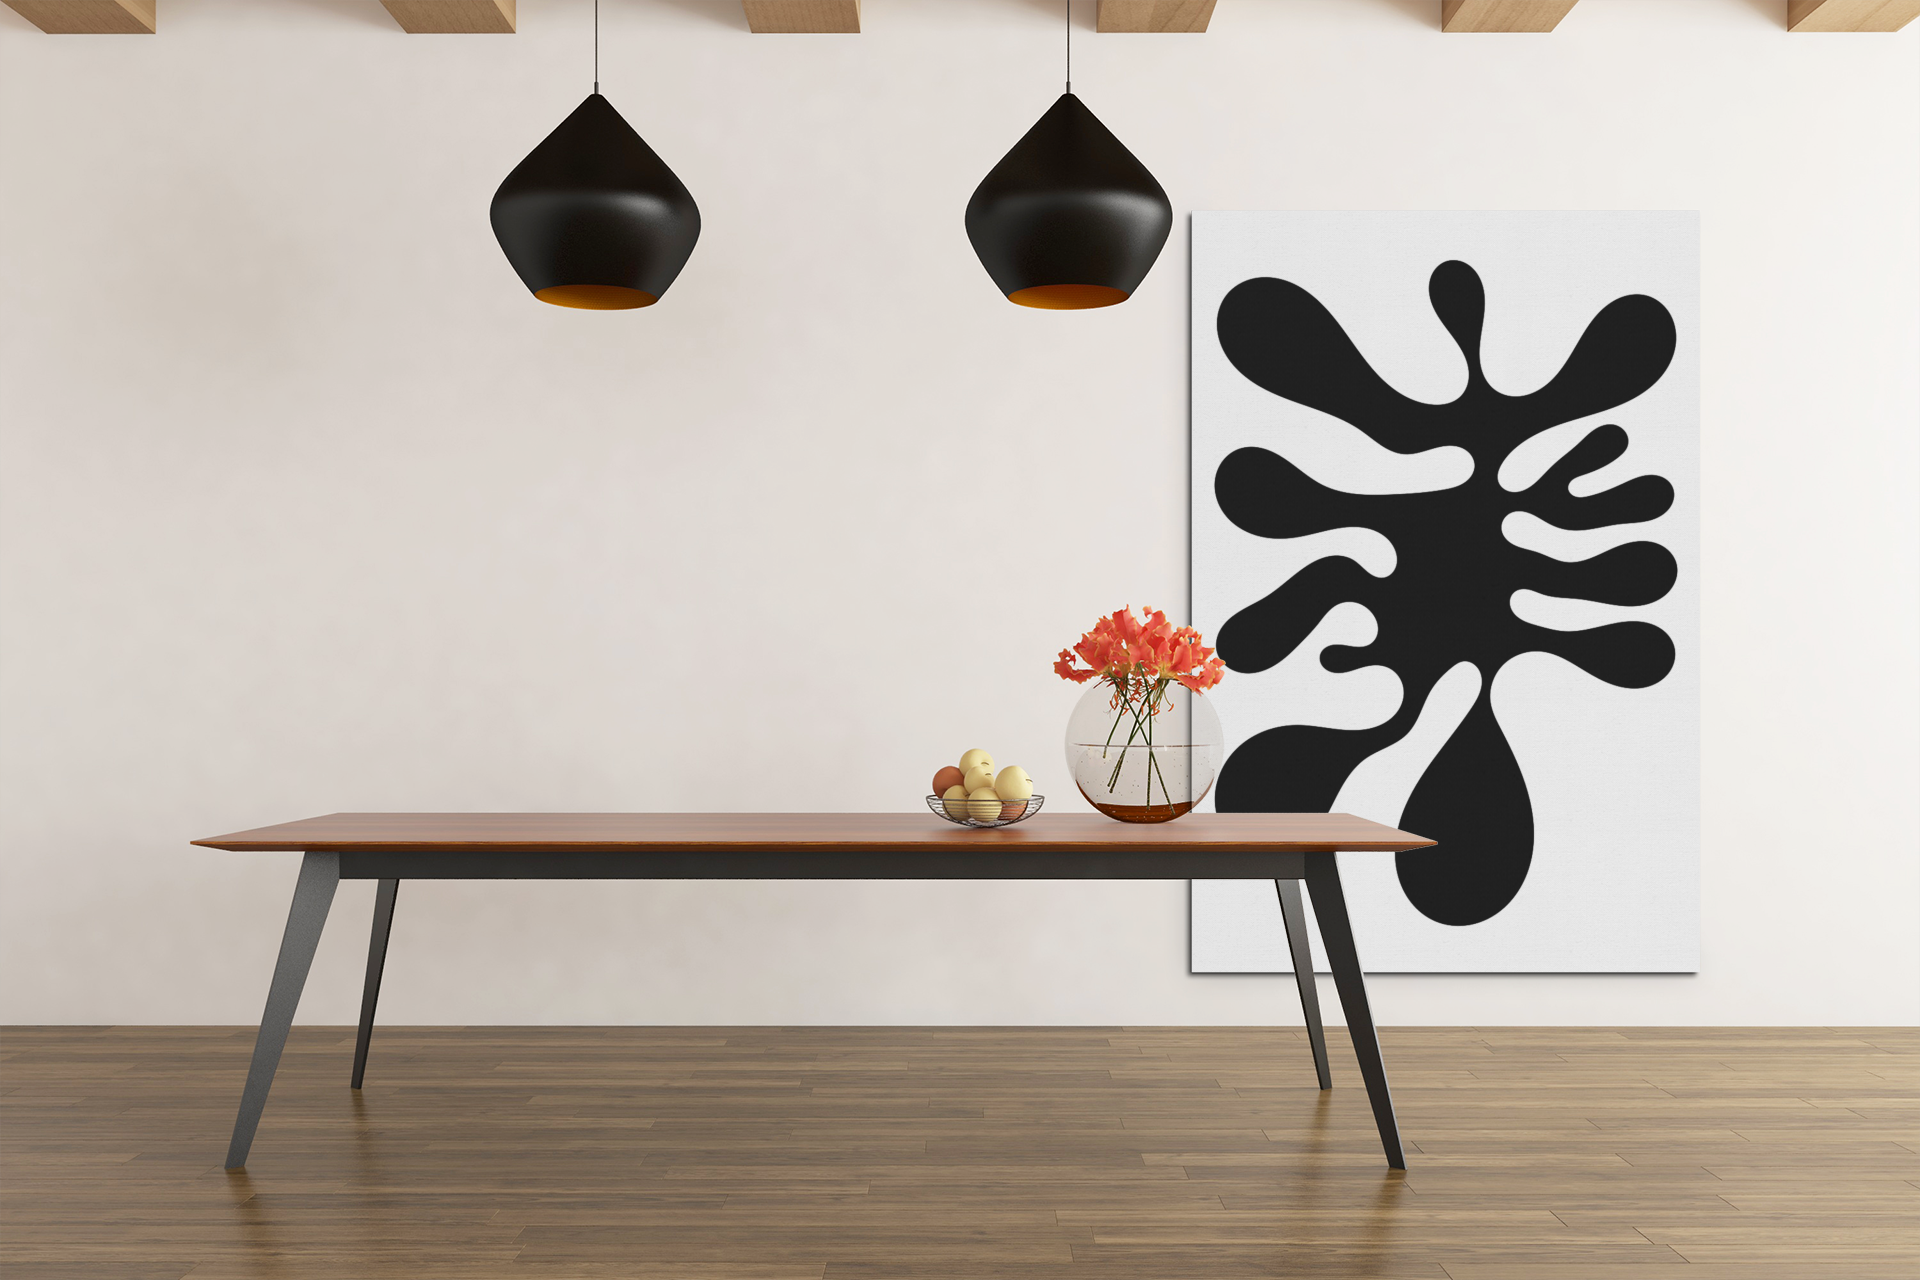 Abstract Wall Art Organic Shapes Nature Art Matisse Inspired Wall Decor Printable Art Art Print Downloadable Design Digital Download Abstract Wall Art Printable Art Wall Decor